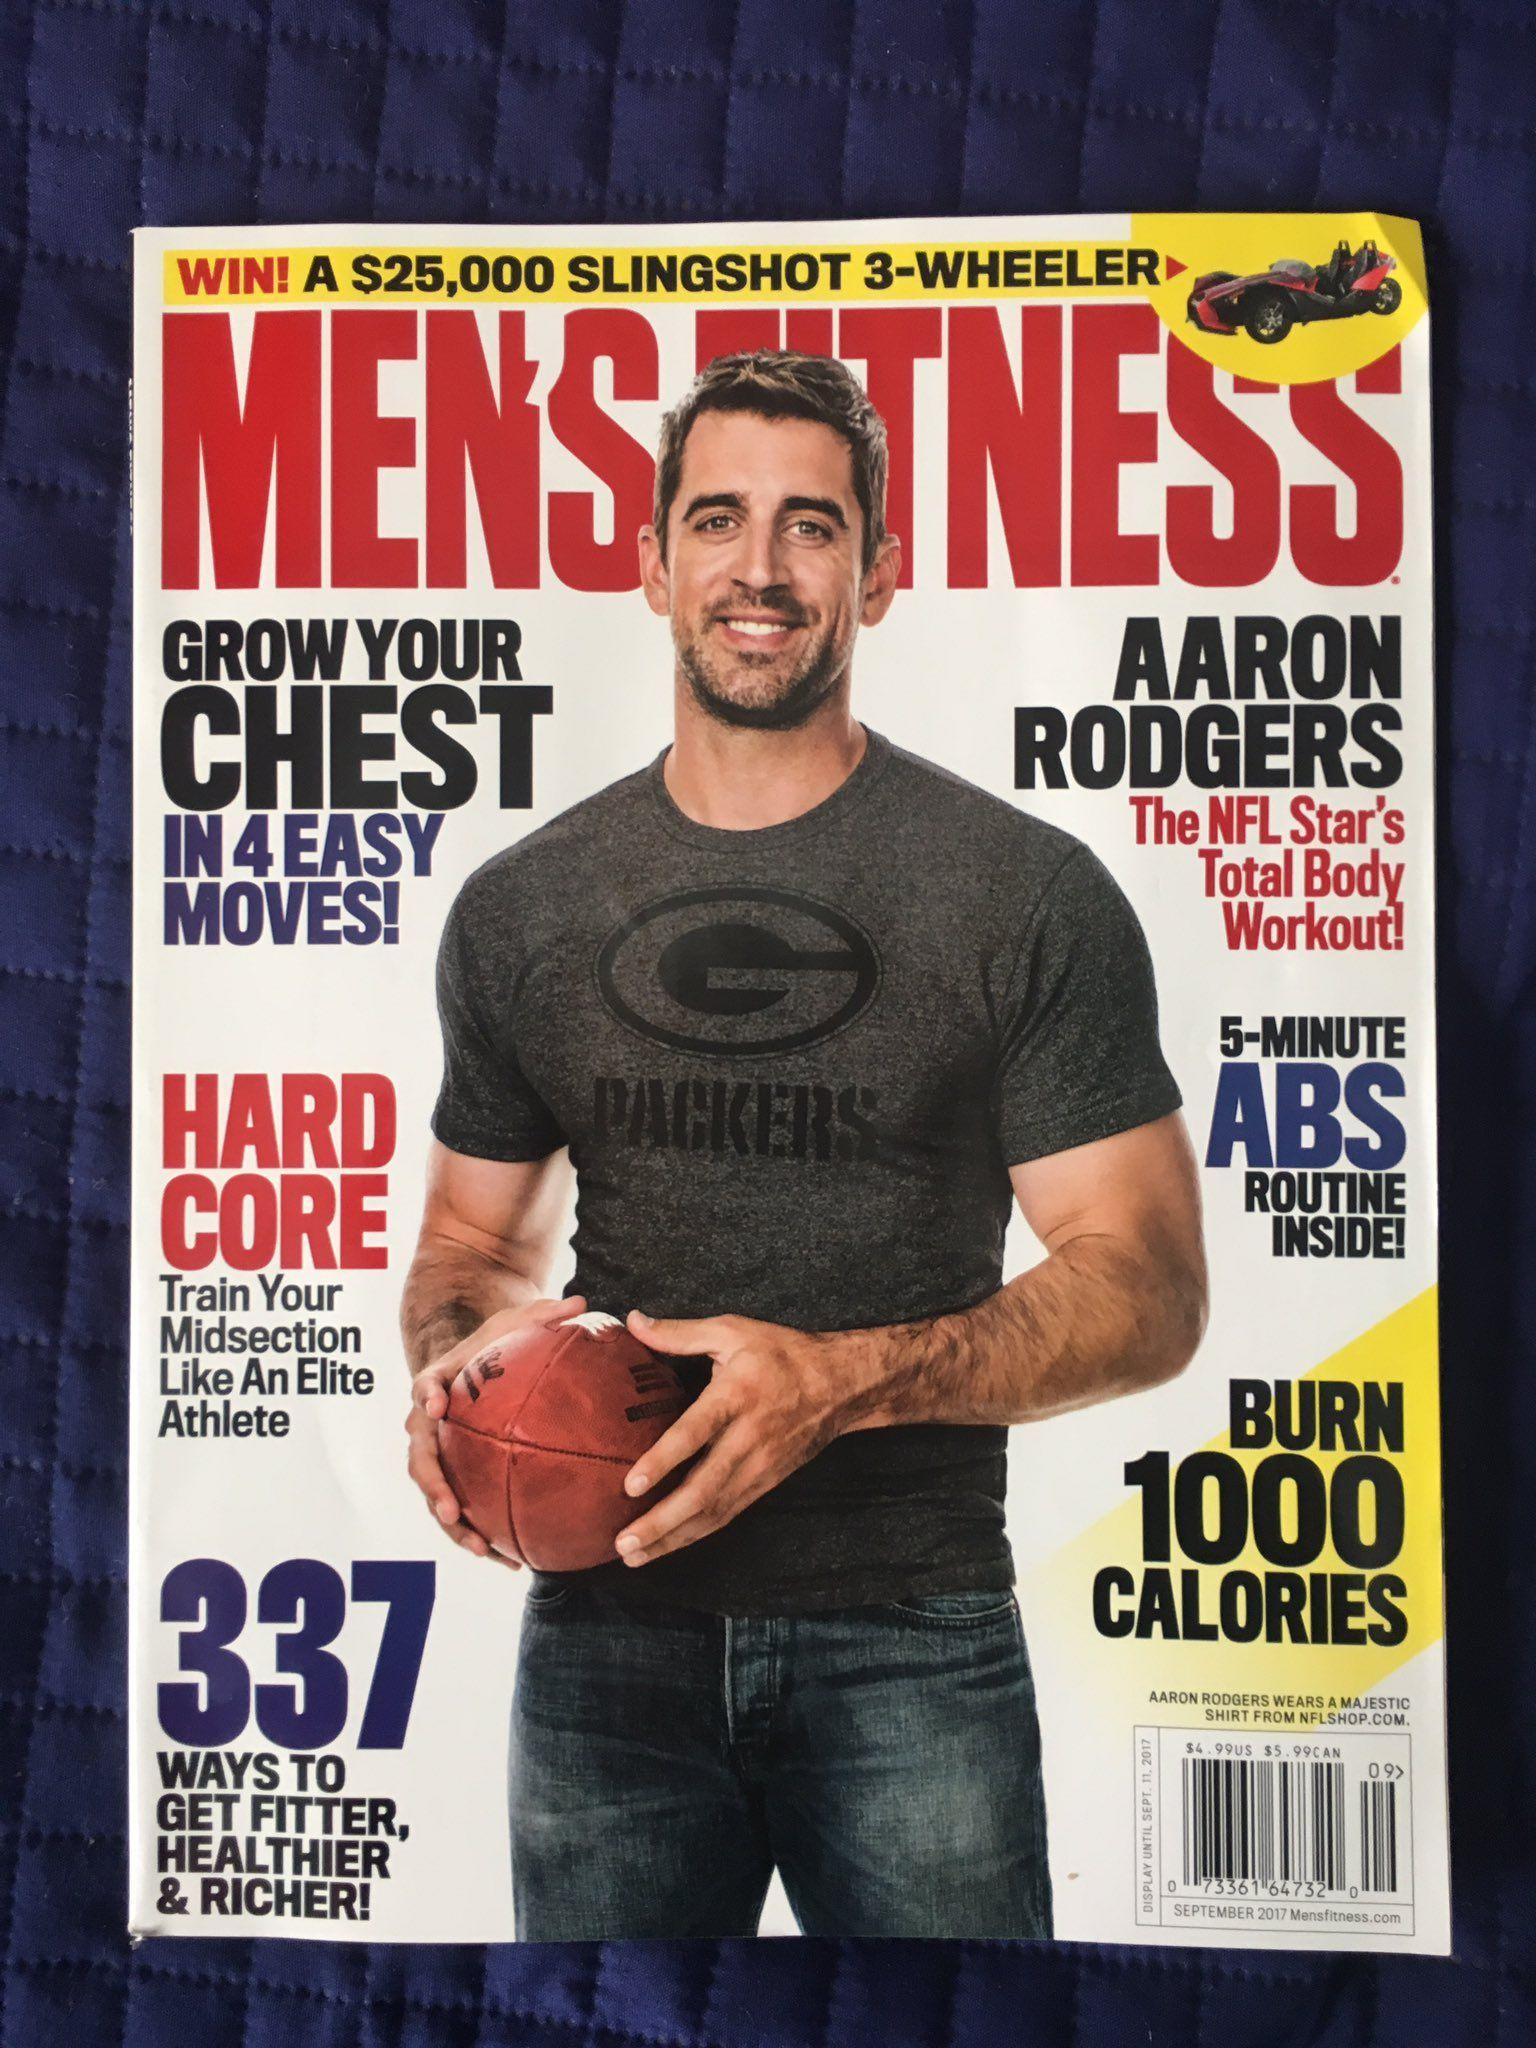 Brian L Jones On Twitter Mens Fitness Magazine Fitness Magazine Aaron Rodgers